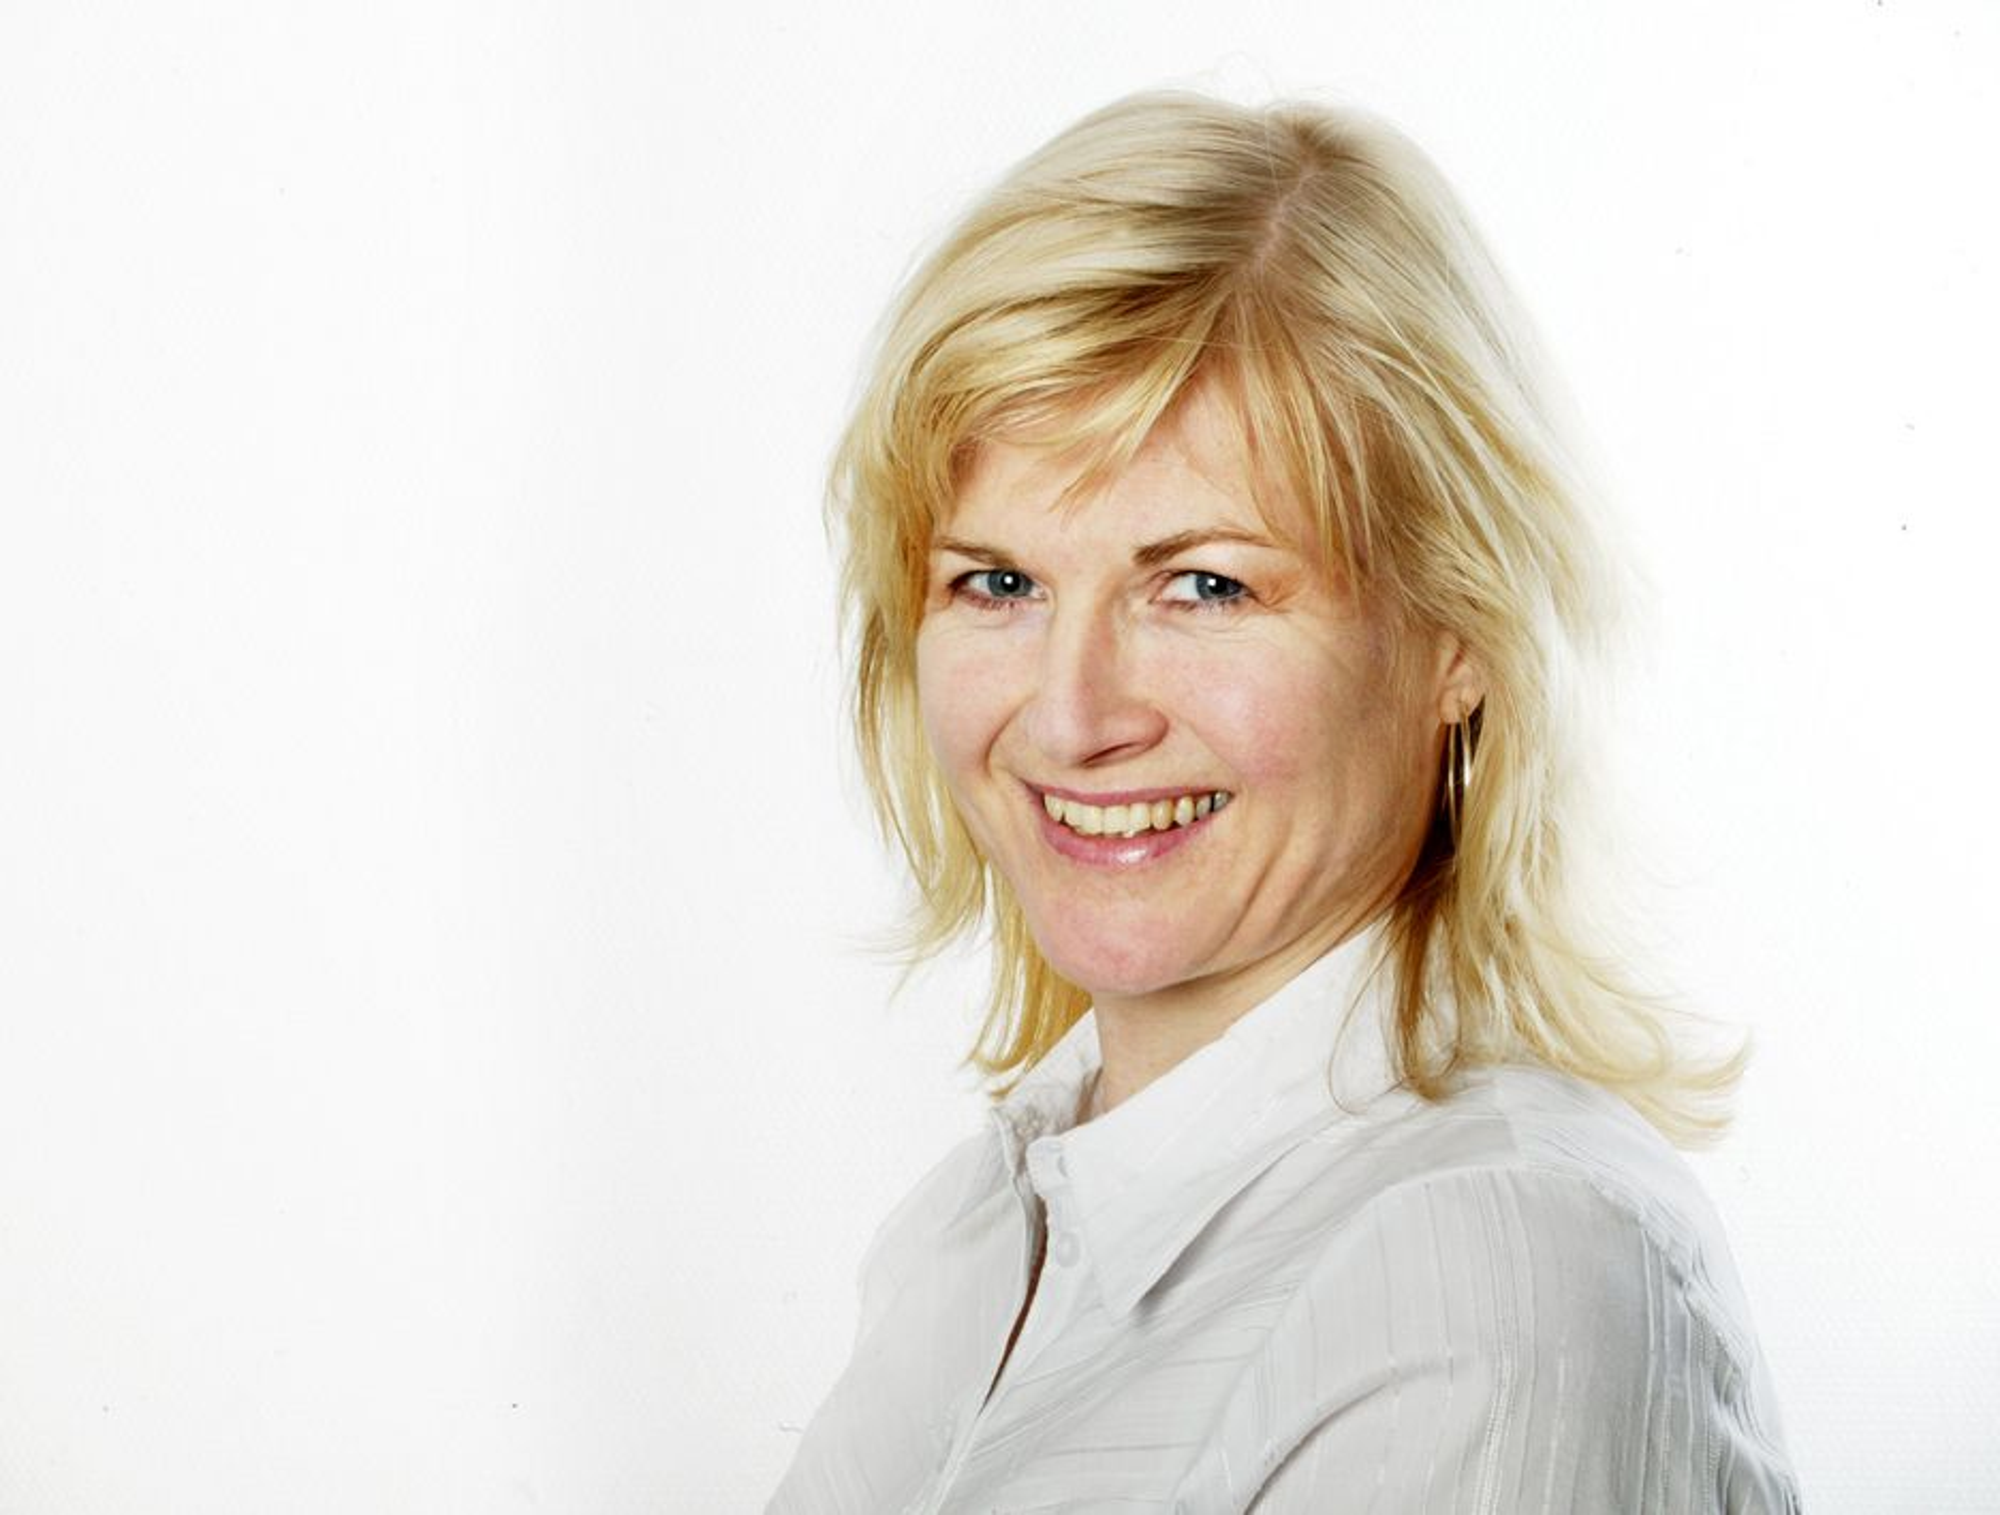 SKIFTER JOBB: Veslemøy Nestvold går fra BNL til Lavenergiprogrammet.